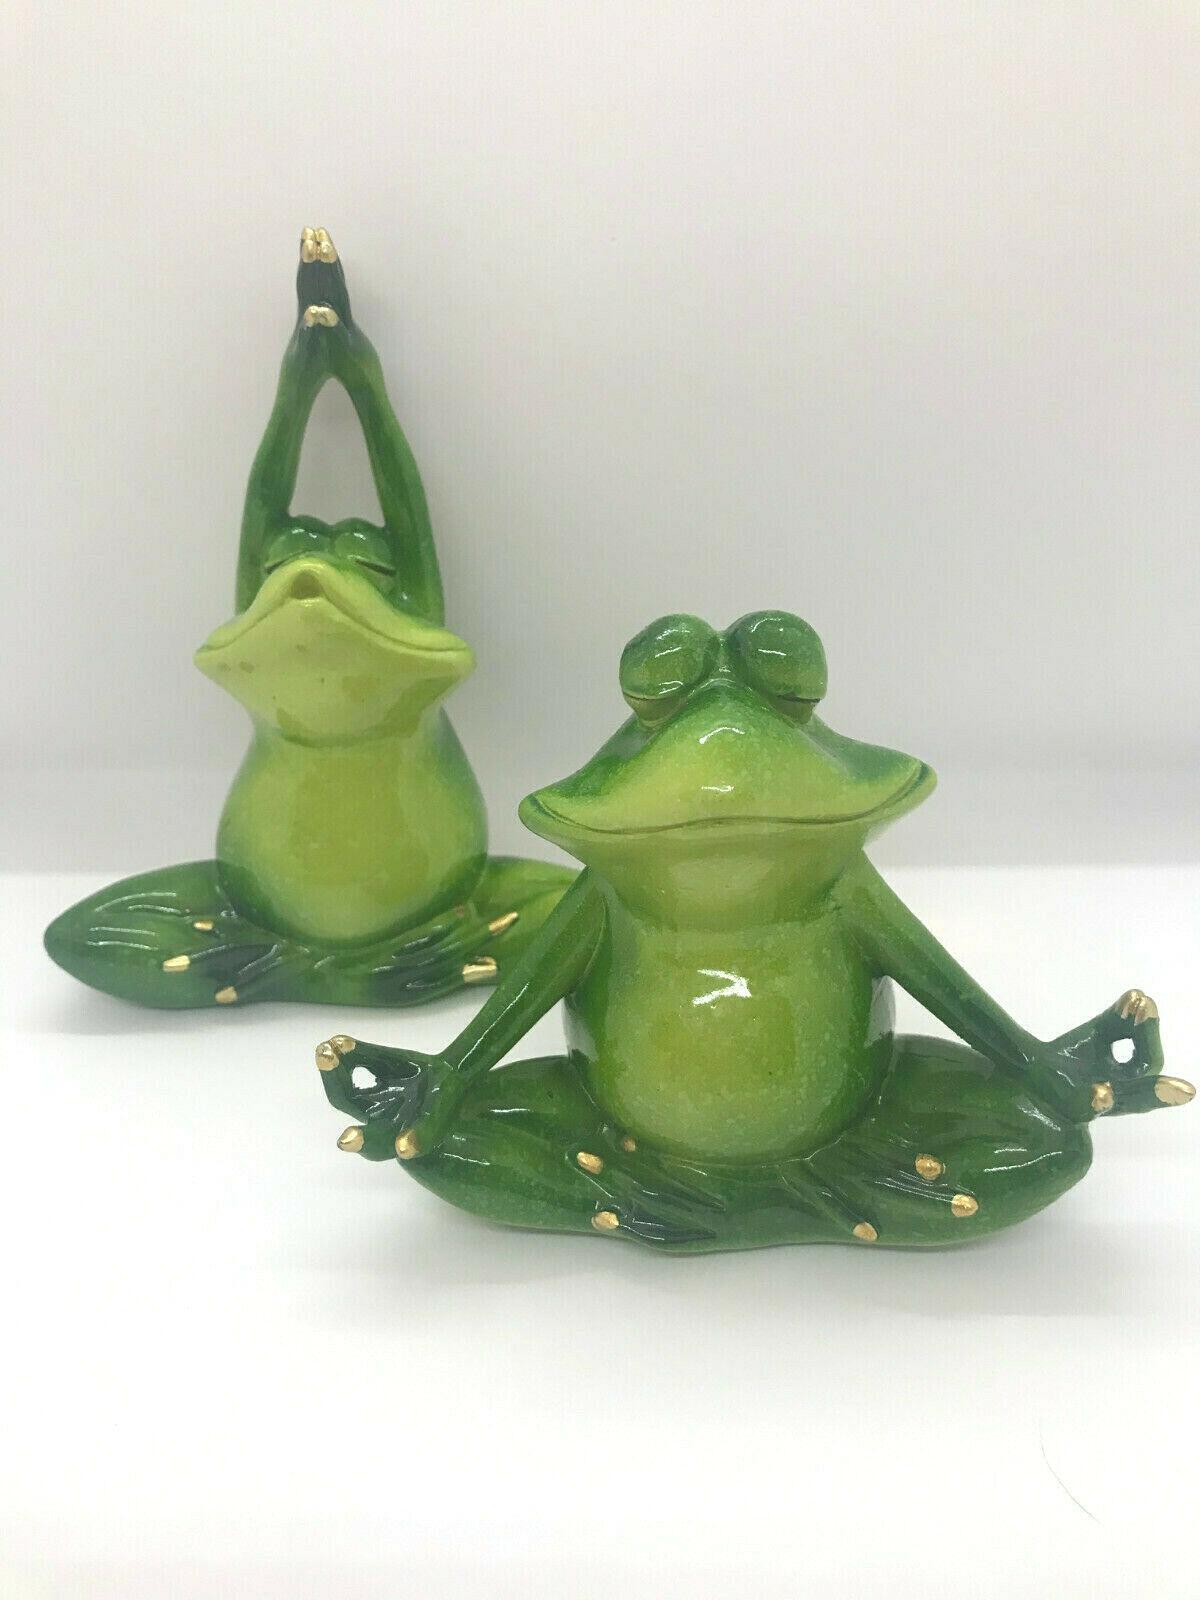 Set of 2 - Pond Life Yoga Frog Figurines - Green Polystone Lotus Poses